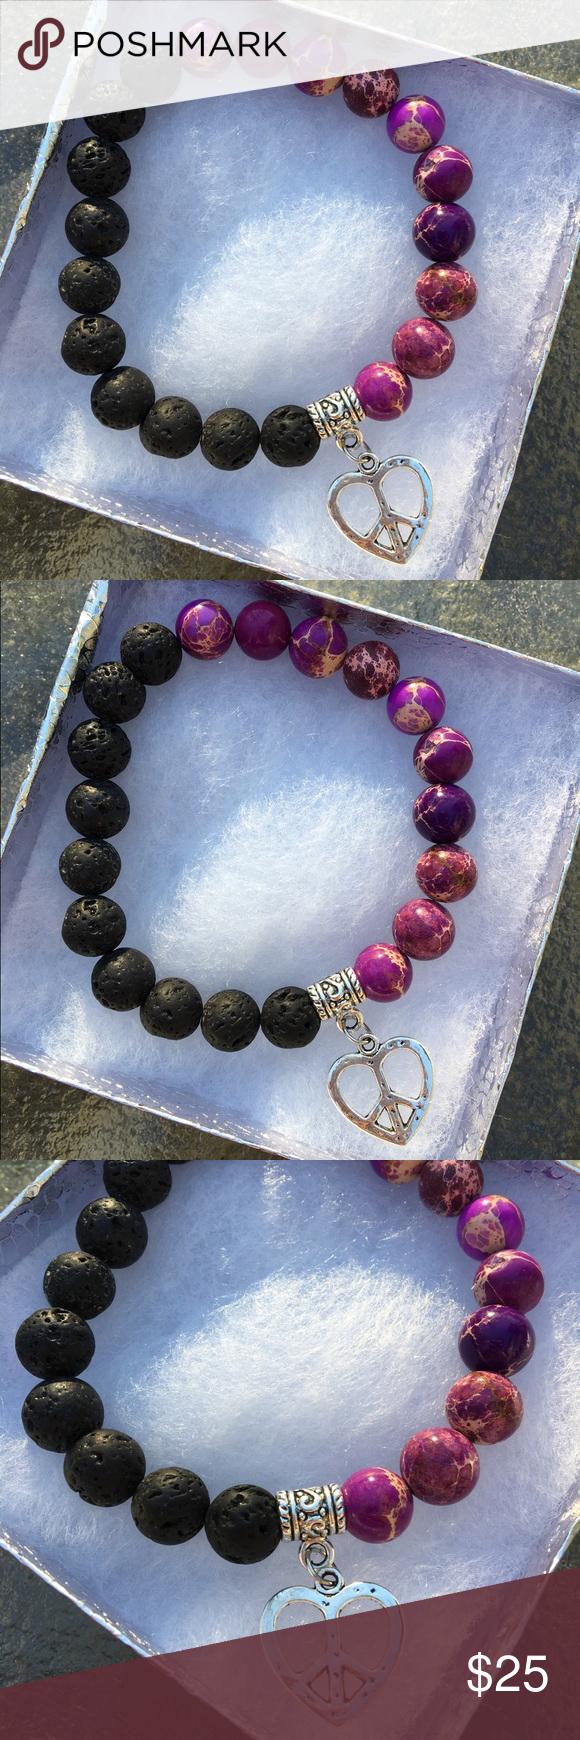 Black Lava Rock and Purple Jasper Beaded Bracelet